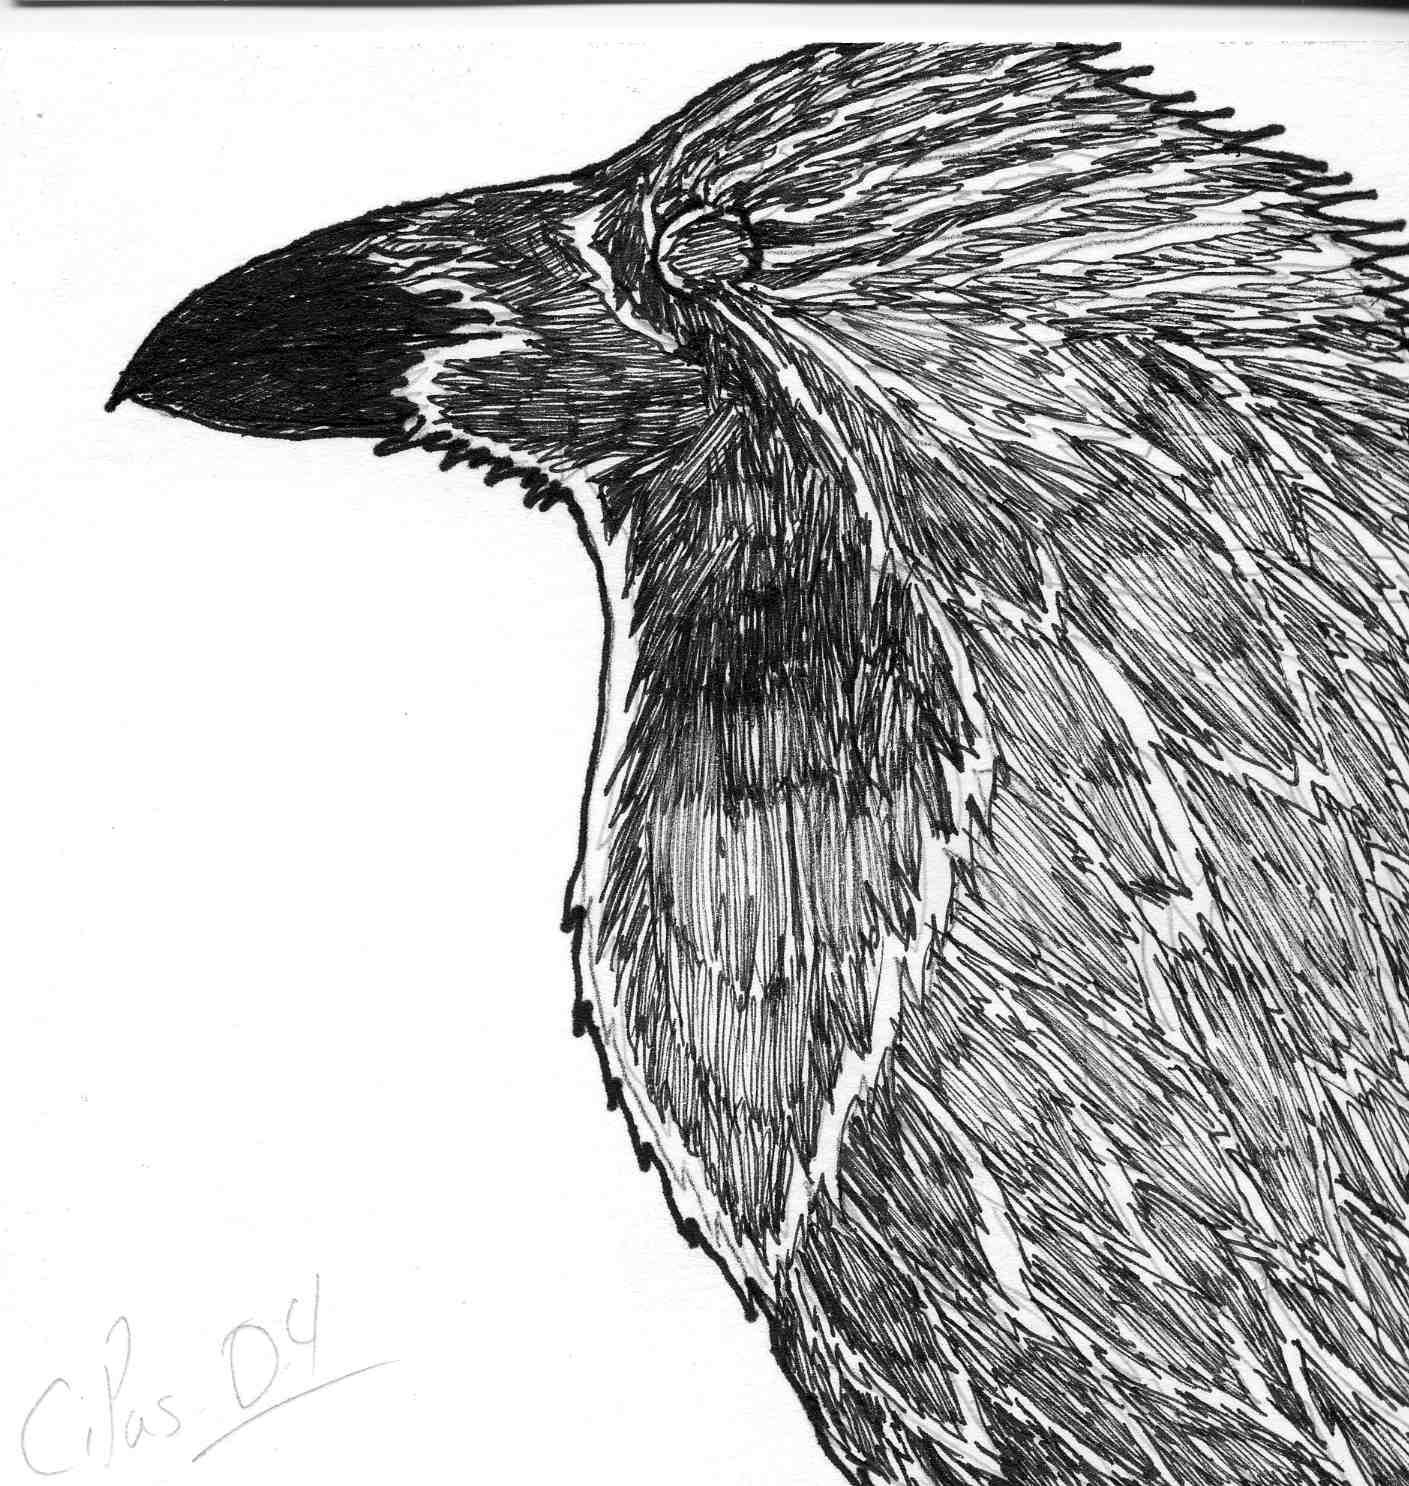 Raven 4 by xacuchina